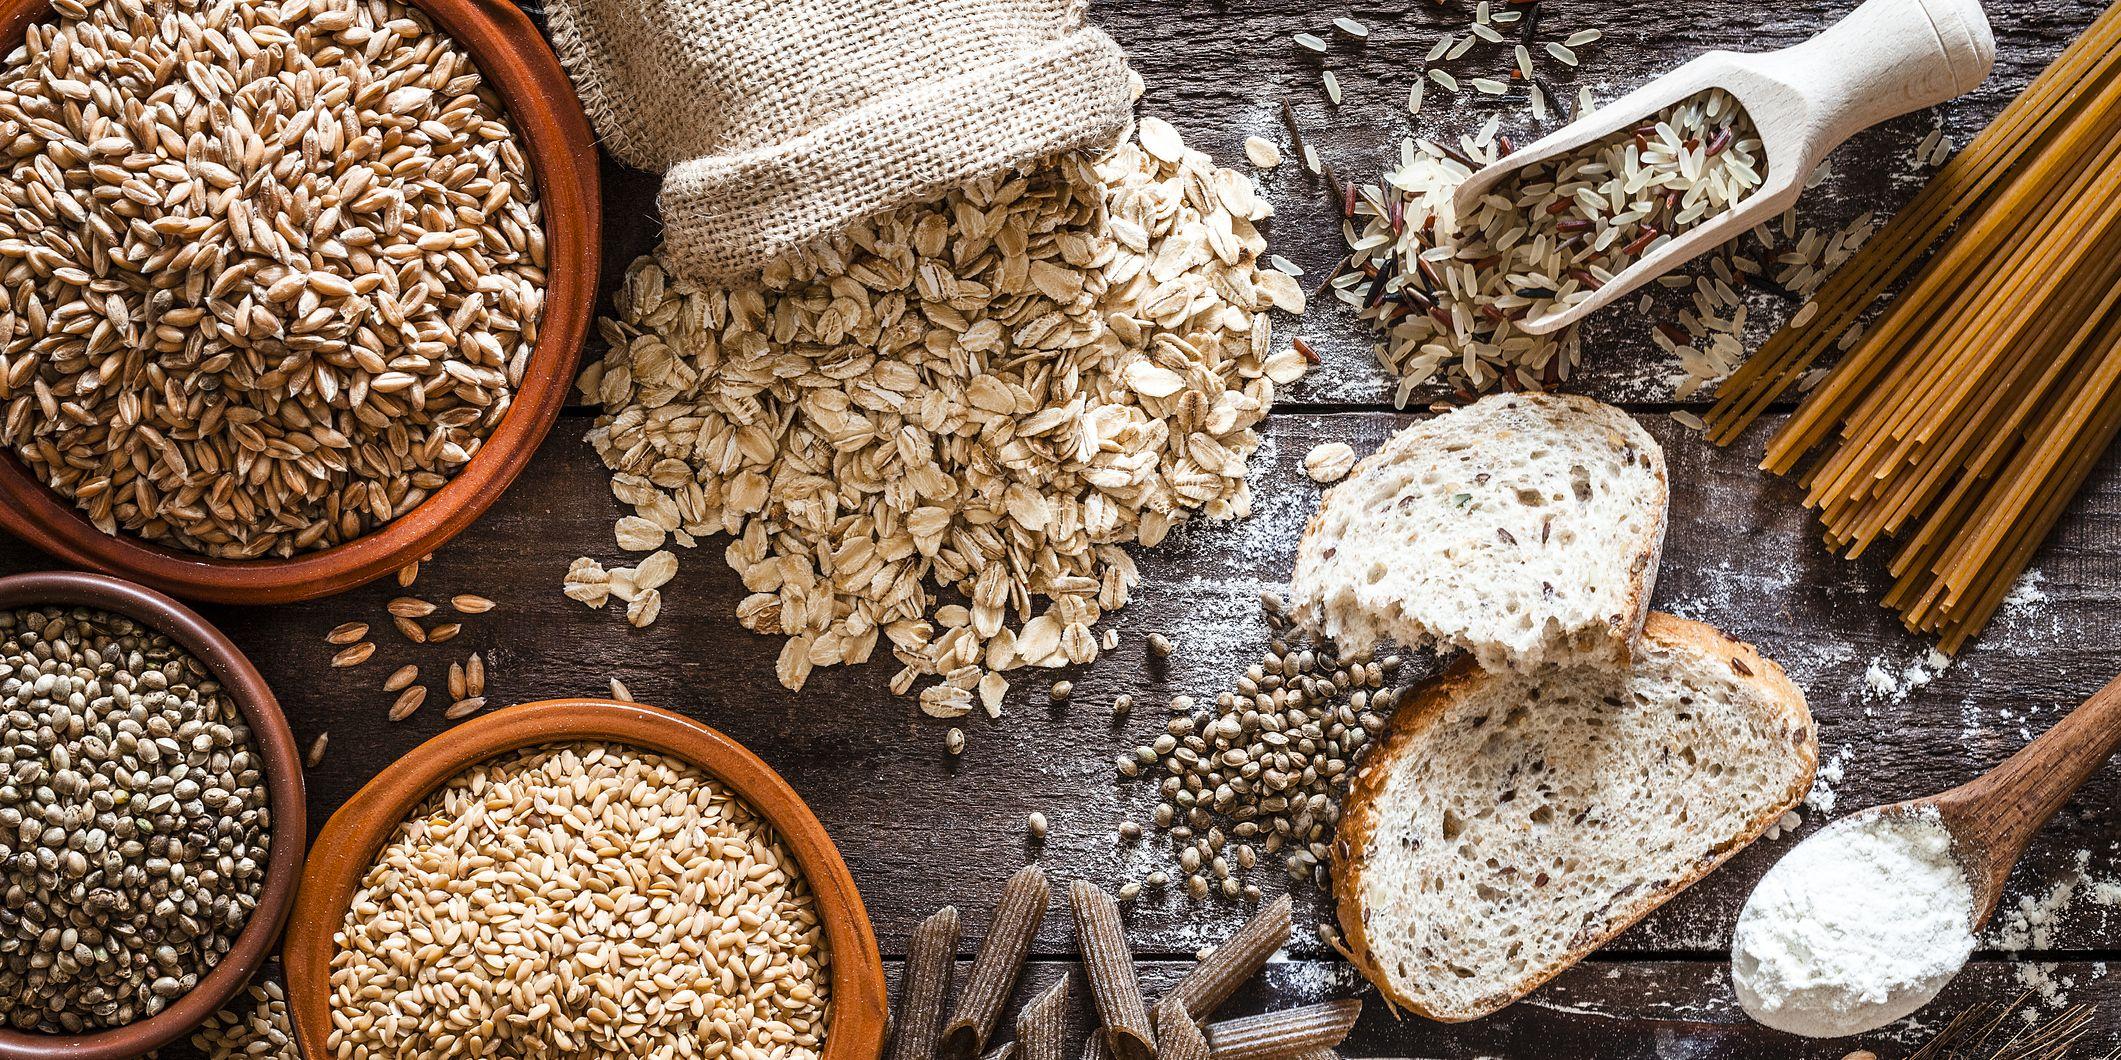 Healthy fibre foods